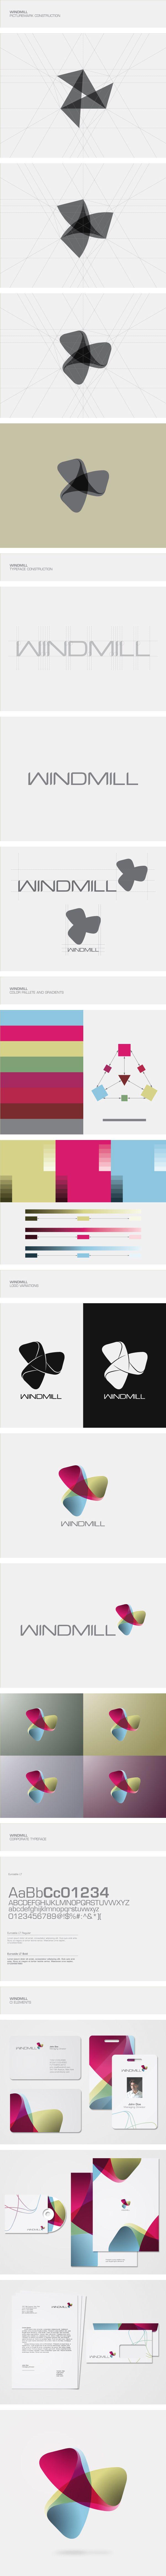 Windmill Visual Identity by Eduard Kovacs